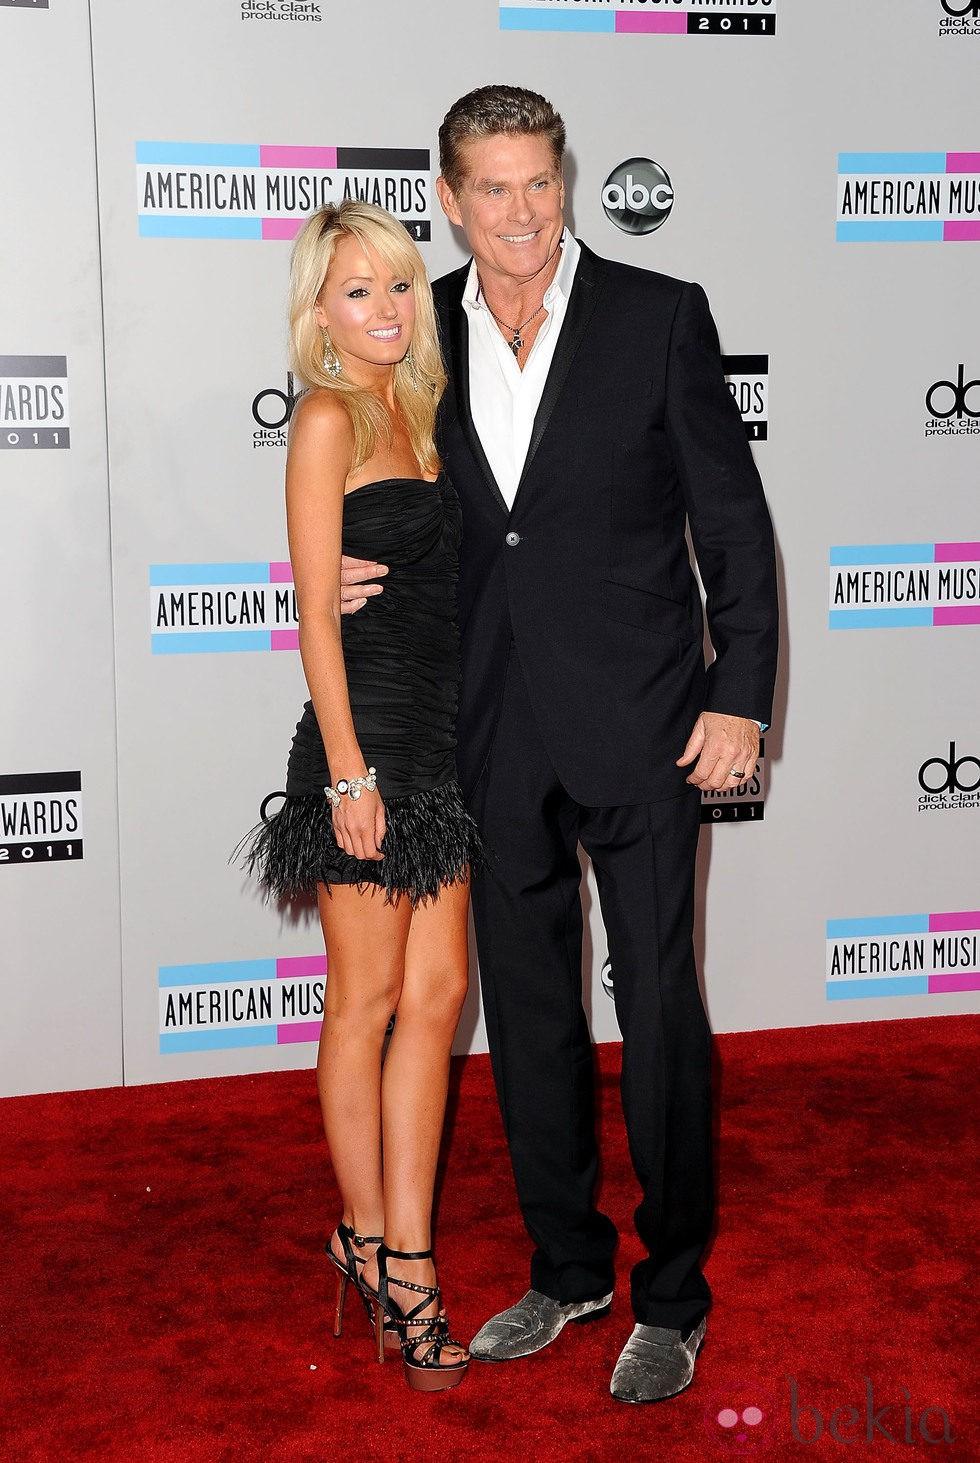 David Hasselhoff en los American Music Awards 2011